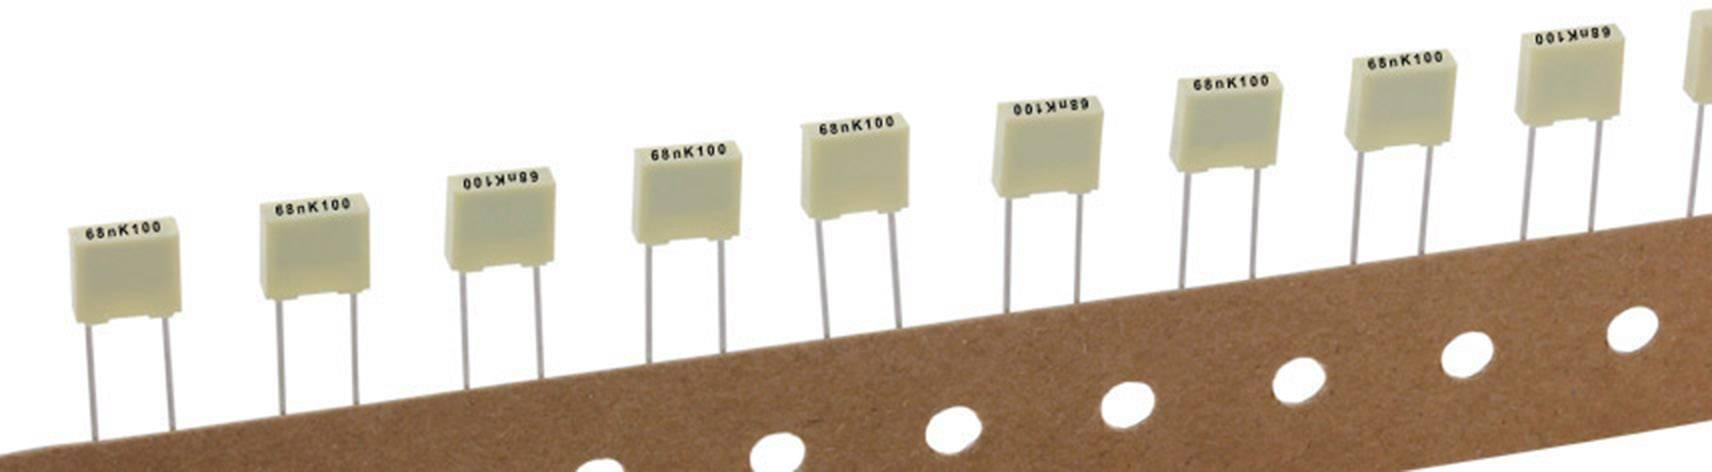 Polyesterový kondenzátor Kemet R82EC1220DQ50K+ radiální, 2.2 nF, 100 V,10 %, 5 mm, (d x š x v) 7.2 x 2.5 mm x 6.5 mm, 1 ks